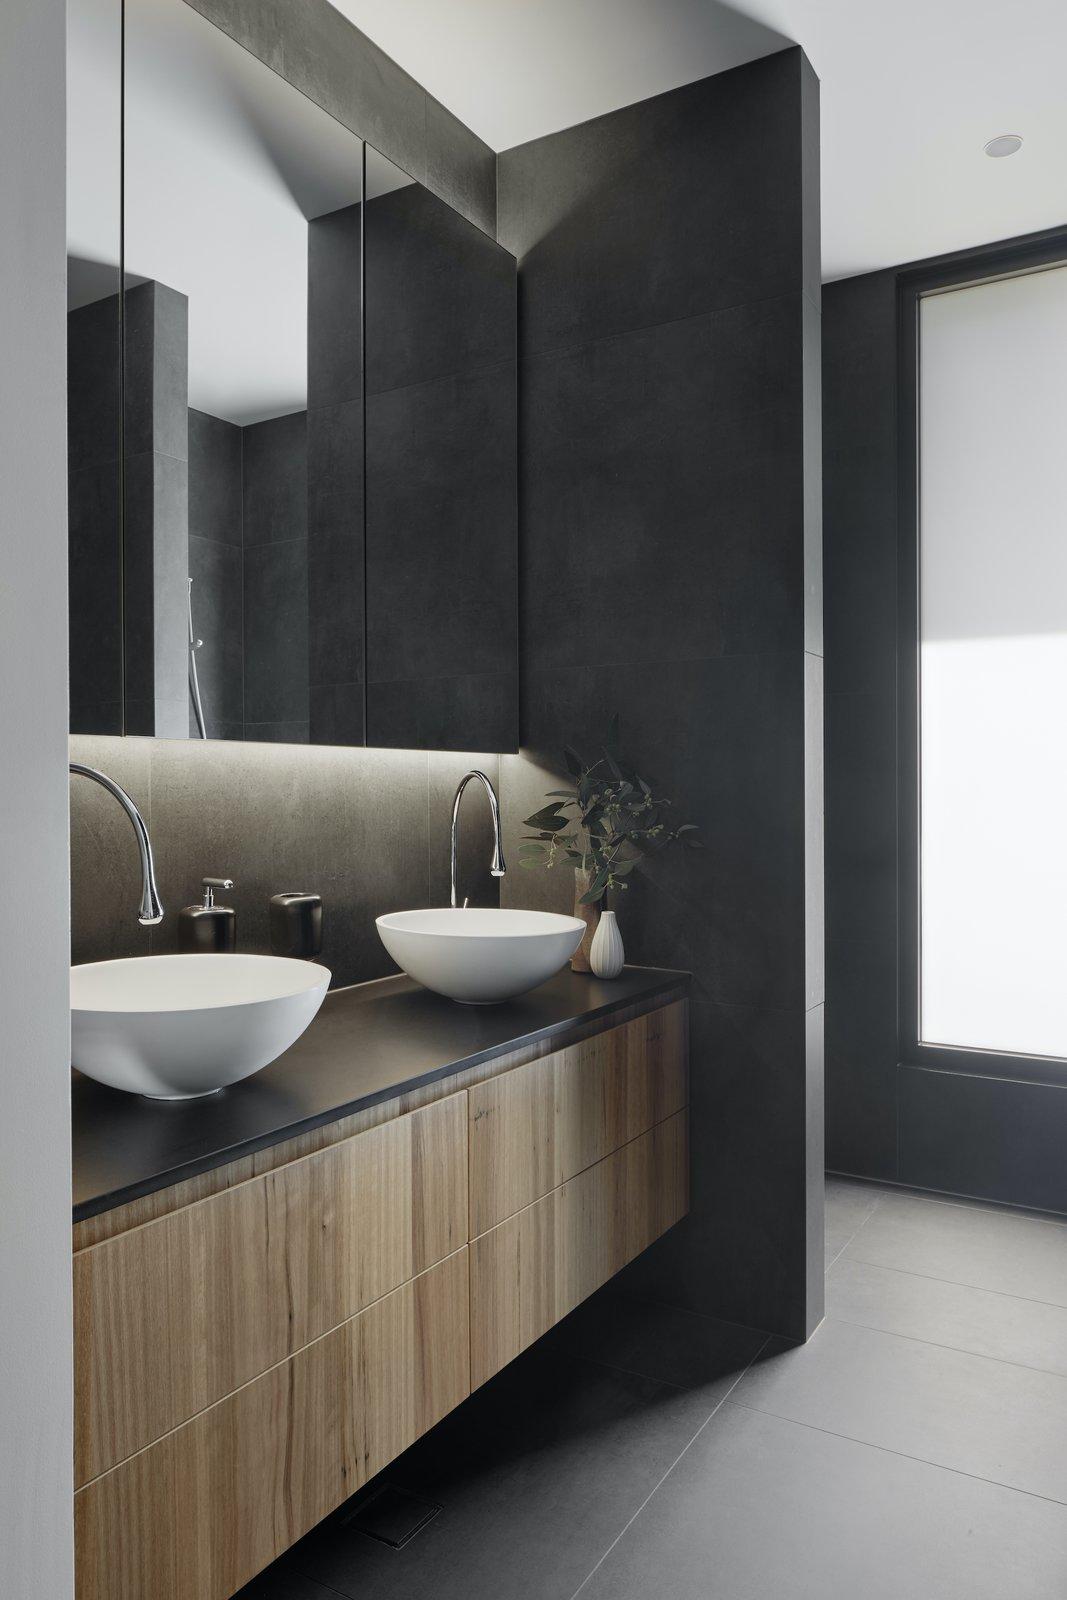 Bathroom of Laurel Grove by Kirsten Johnstone Architecture.